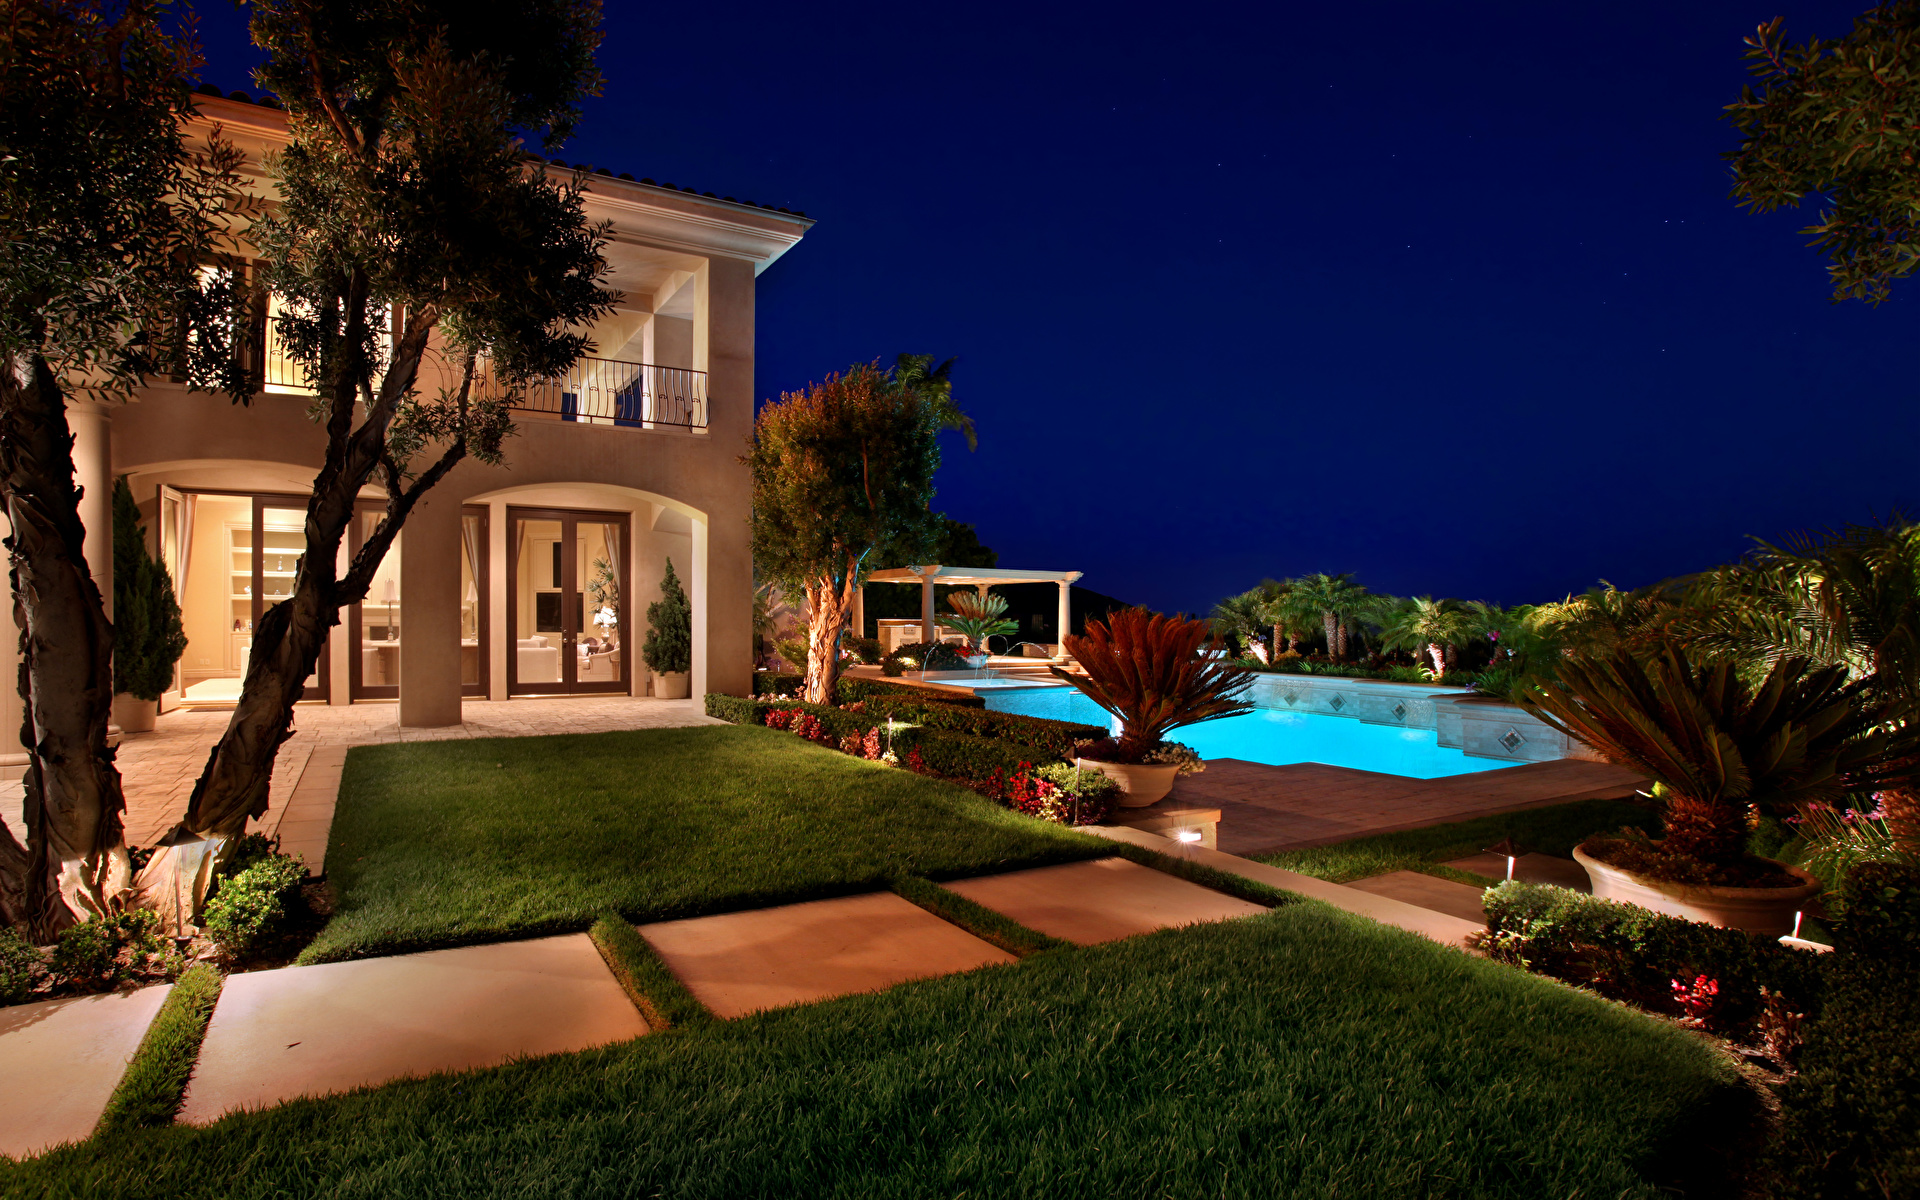 Image Villa USA Pools Fair Harbor Lawn Night Cities 1920x1200 Swimming bath night time